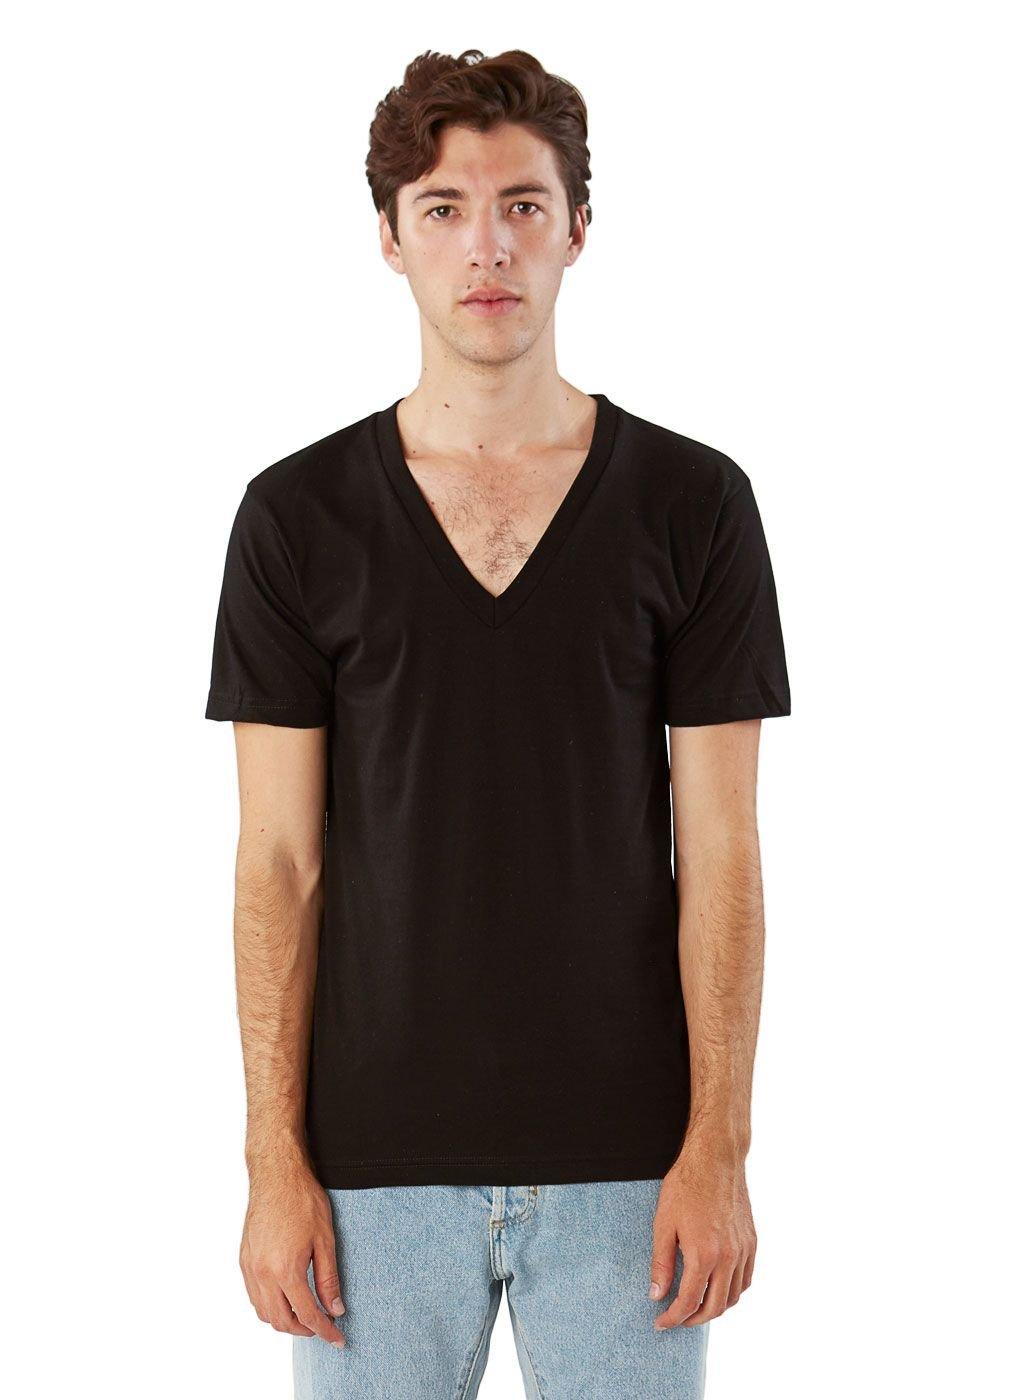 American Apparel Unisex Fine Jersey Short Sleeve V-Neck, Black, X-Large